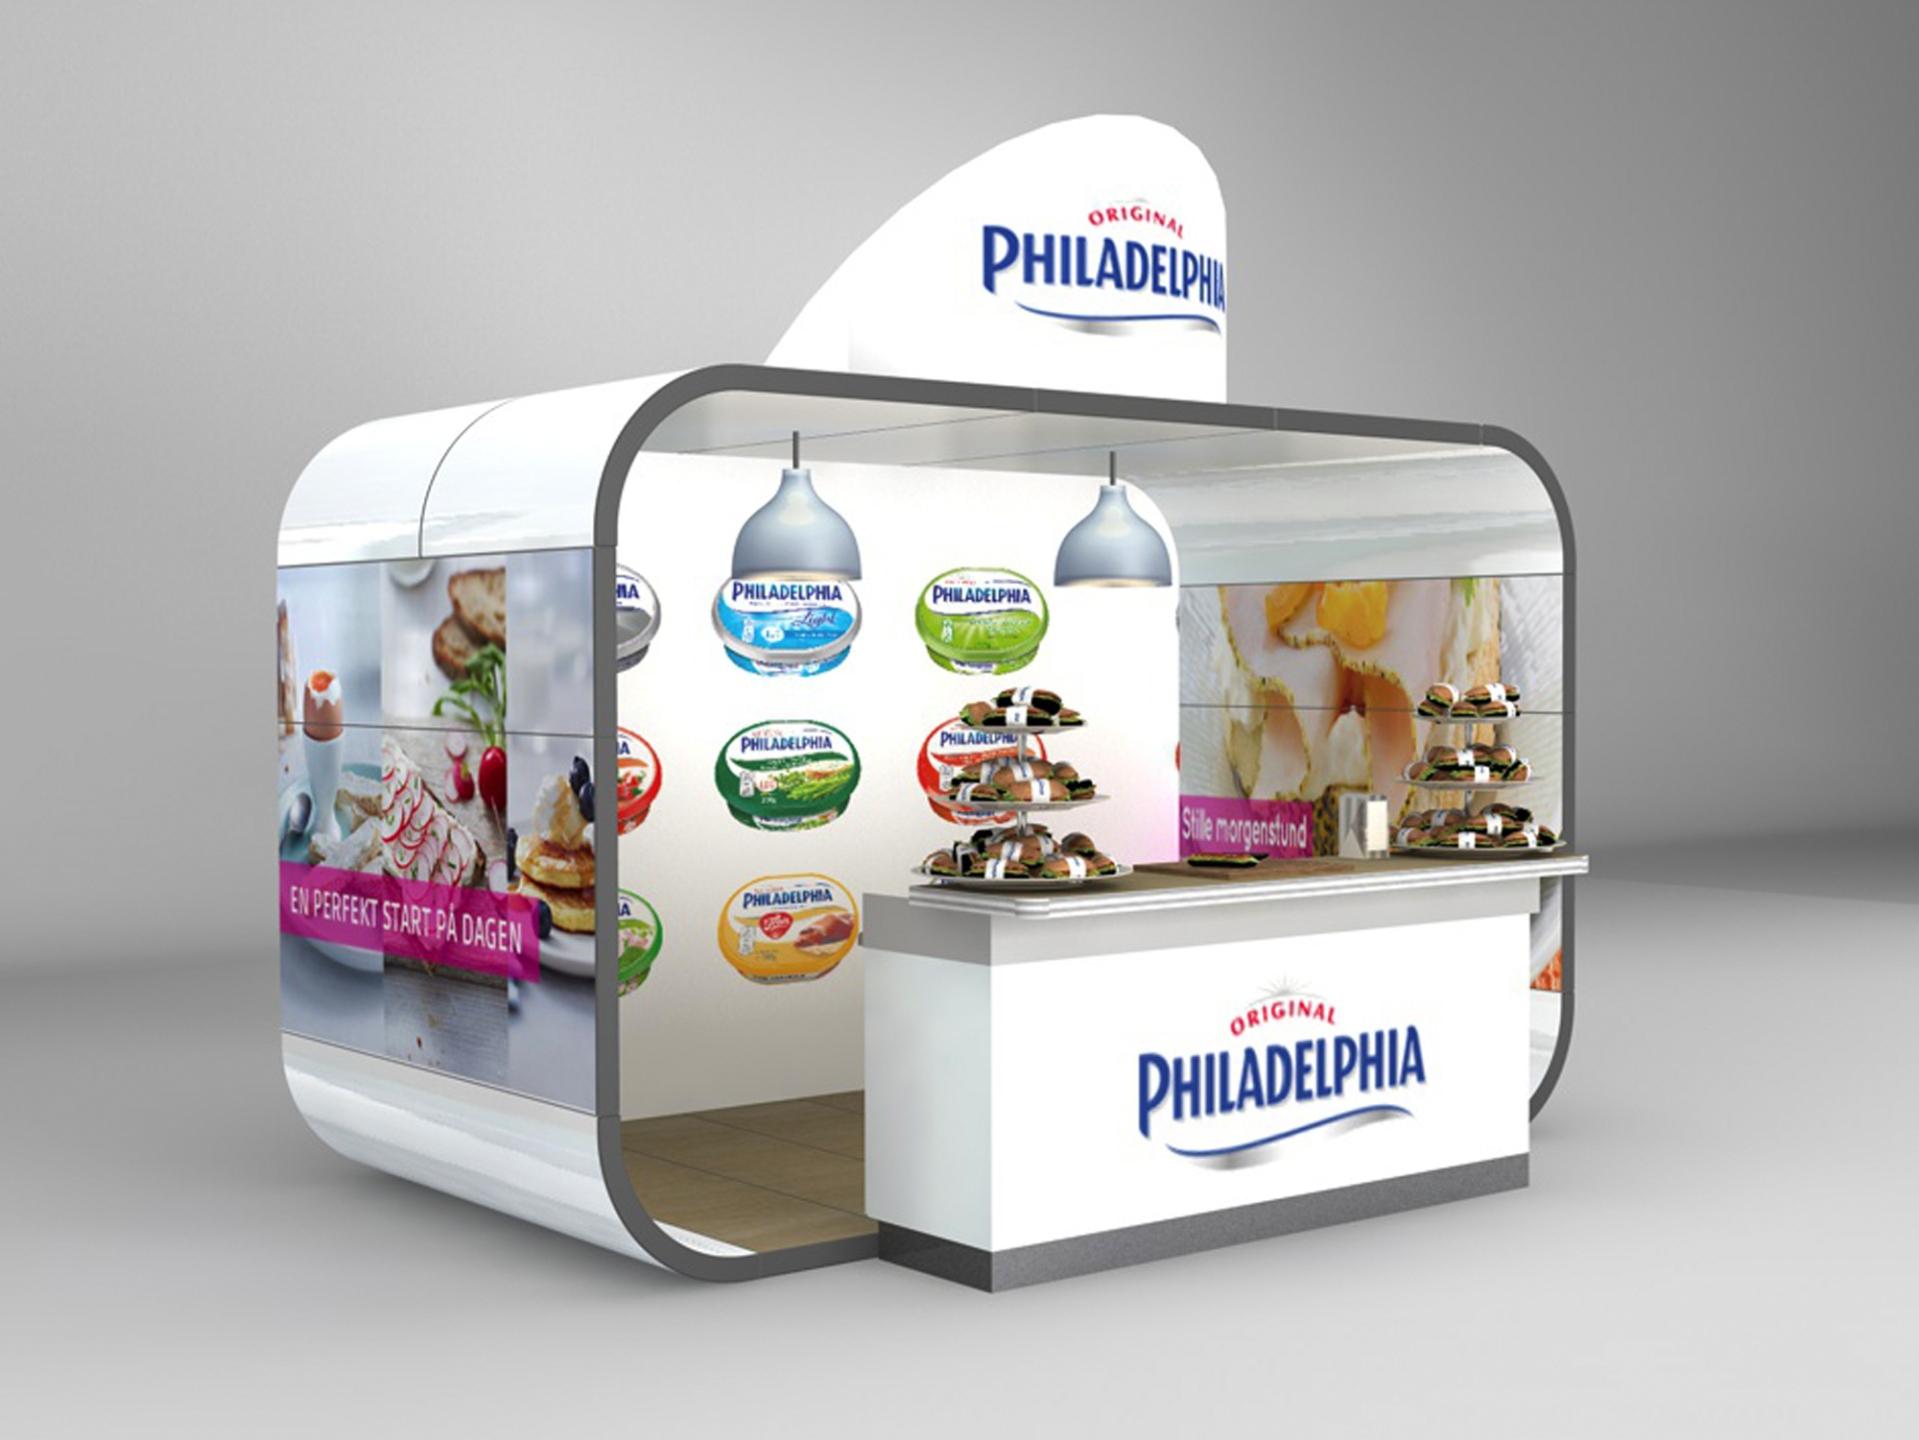 Philadelphia-img-001